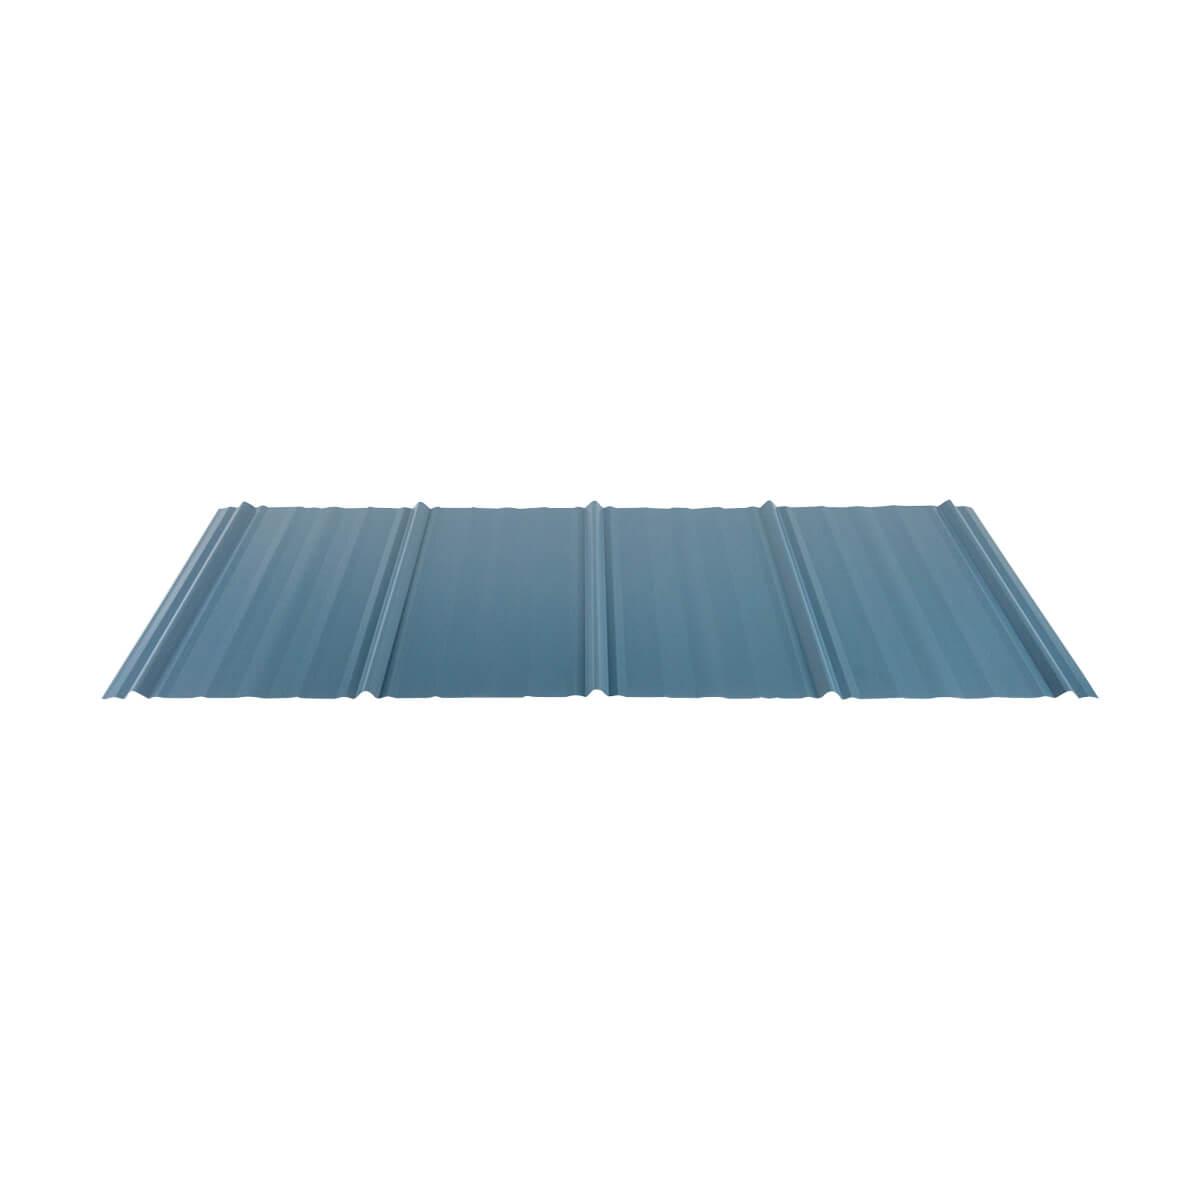 "WeatherShield 1 Metal Sheets or Panels - 32"" x 16'"